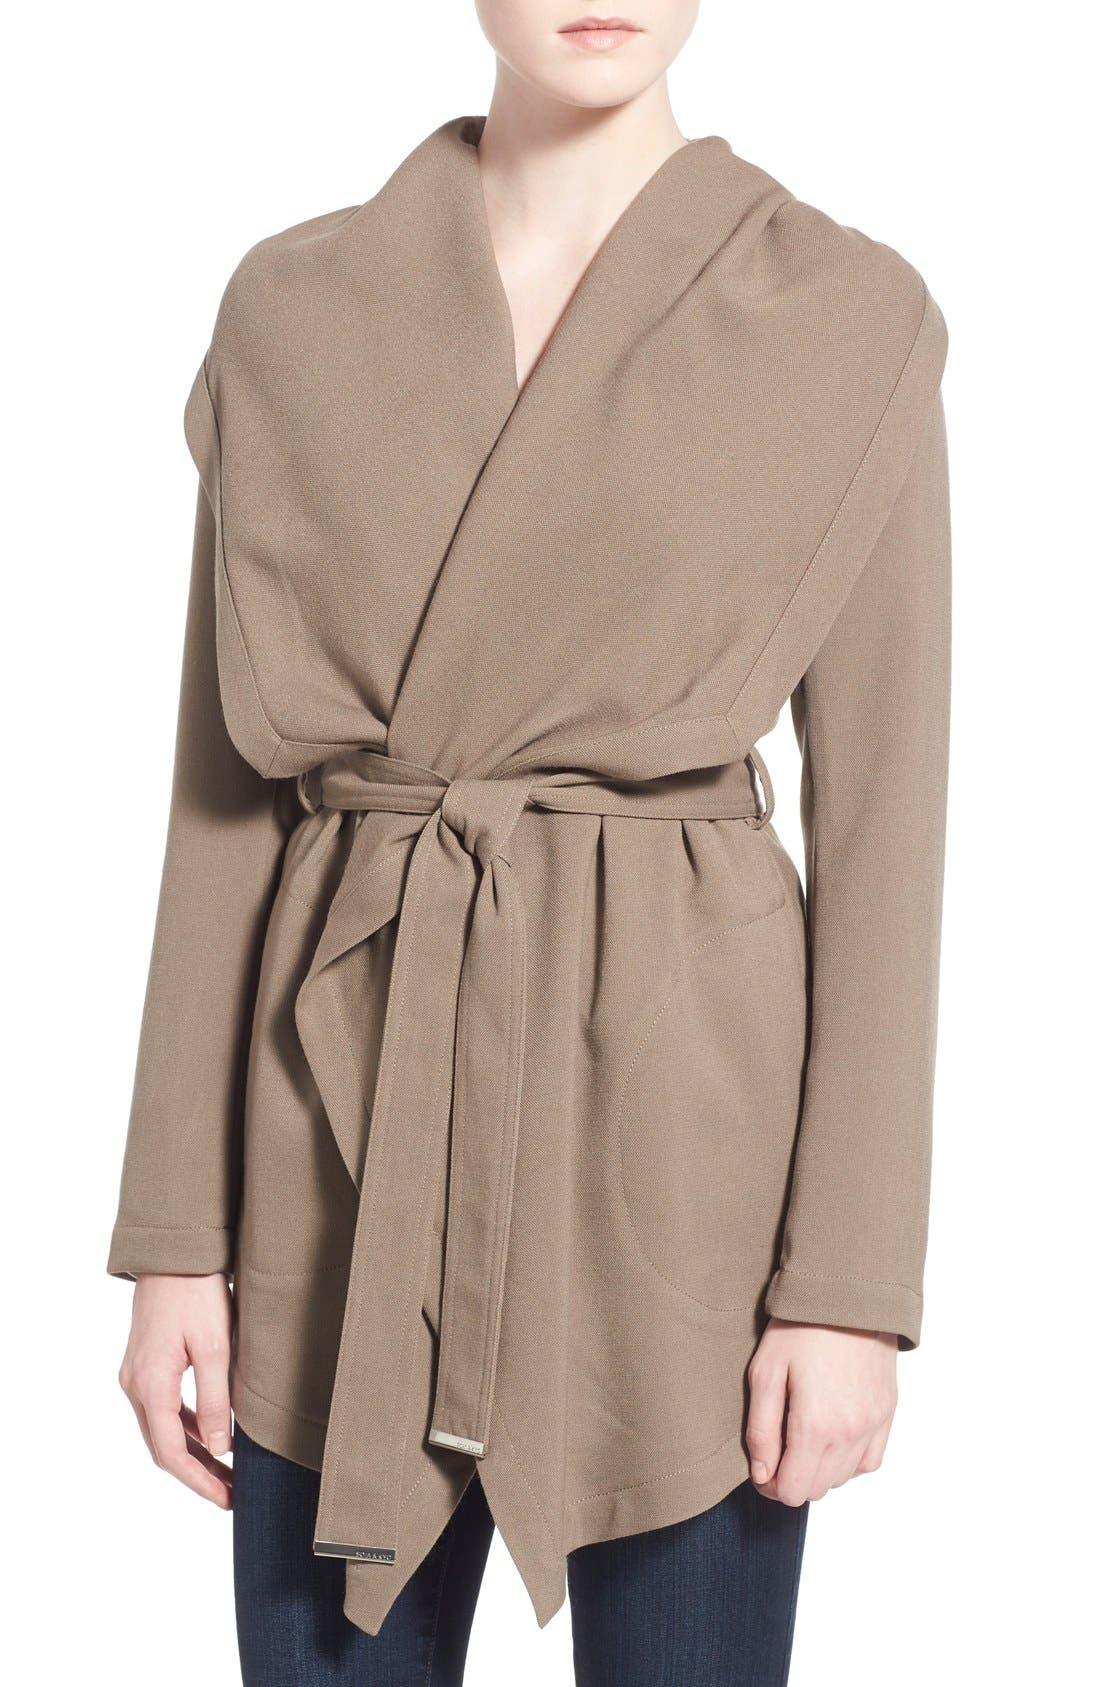 Main Image - Soia & Kyo Hip Length Drapey Hooded Wrap Coat